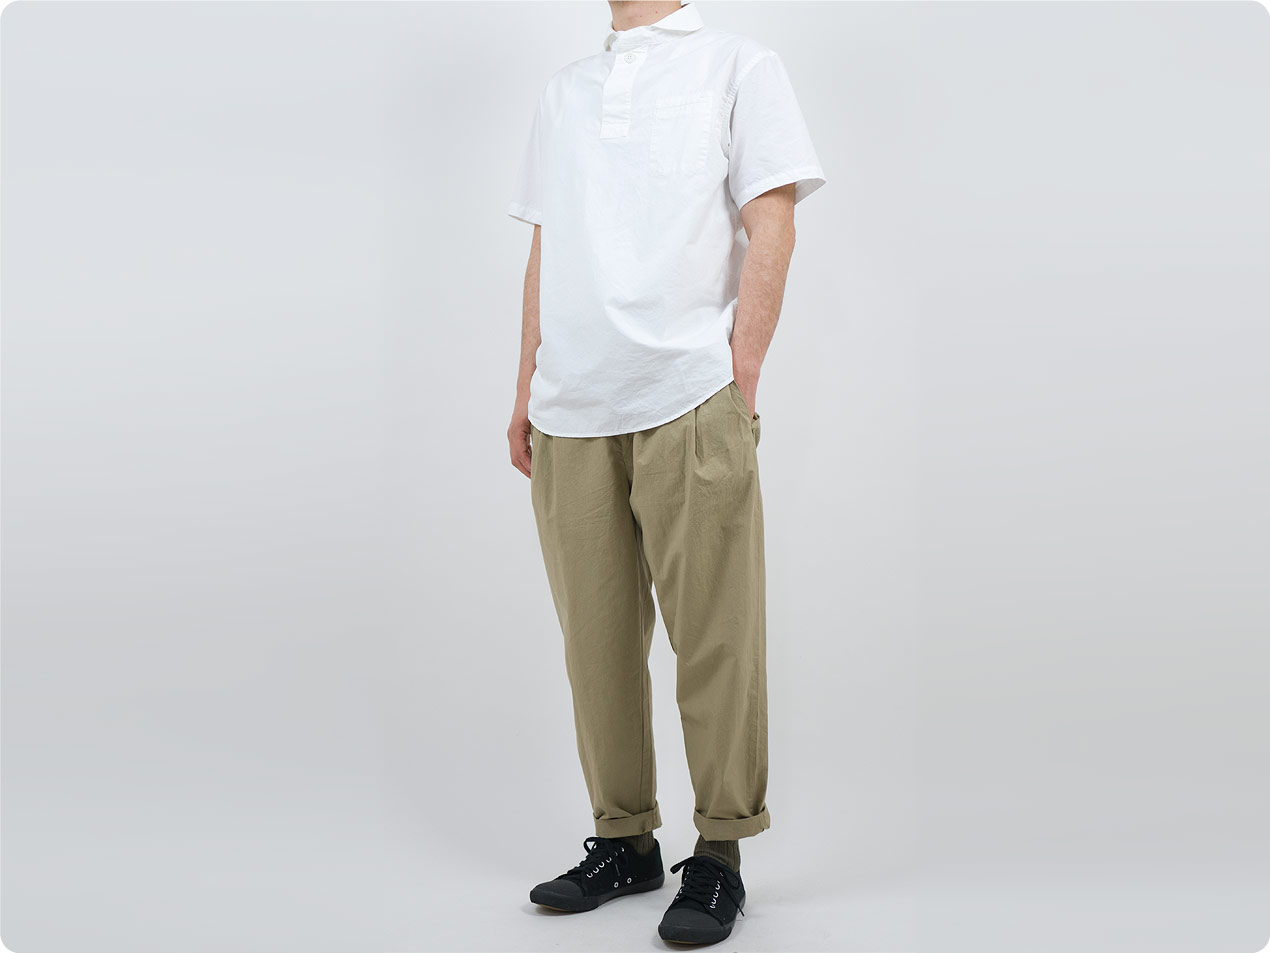 LOLO コットン半袖 プルオーバーシャツ / ステッチなし半袖シャツ